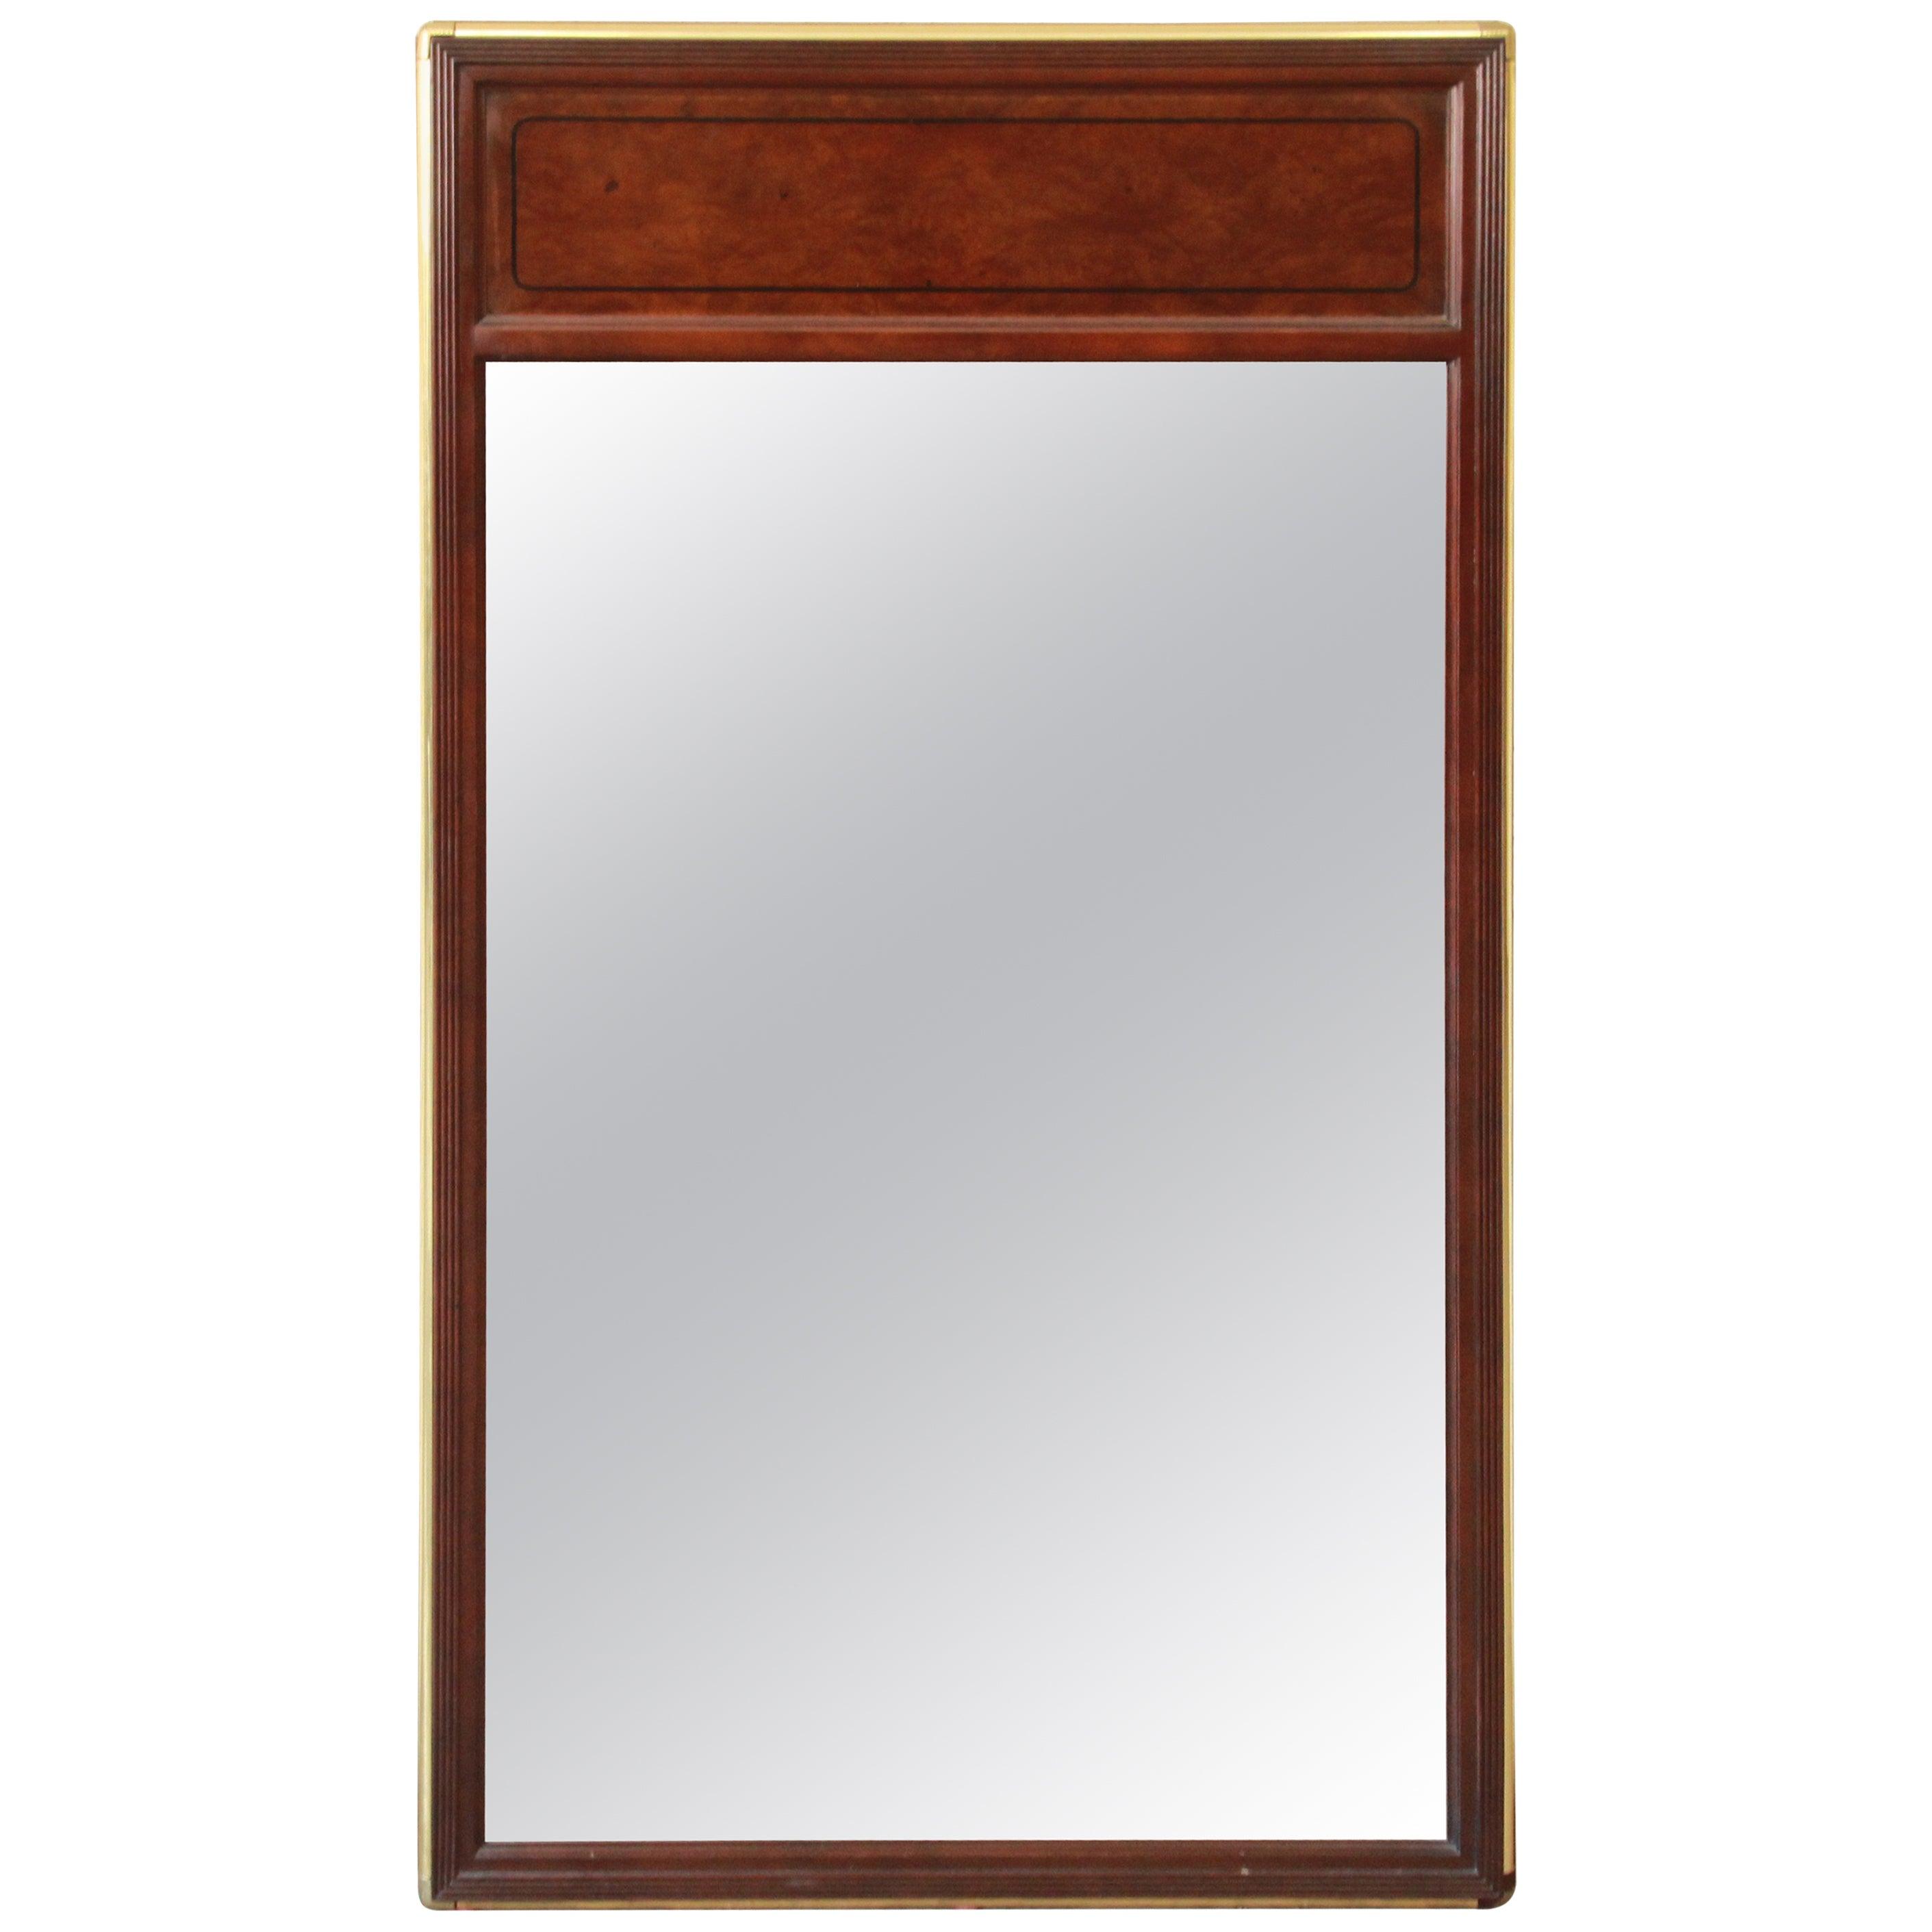 Baker Furniture Hollywood Regency Campaign Burl Wood and Brass Framed Mirror